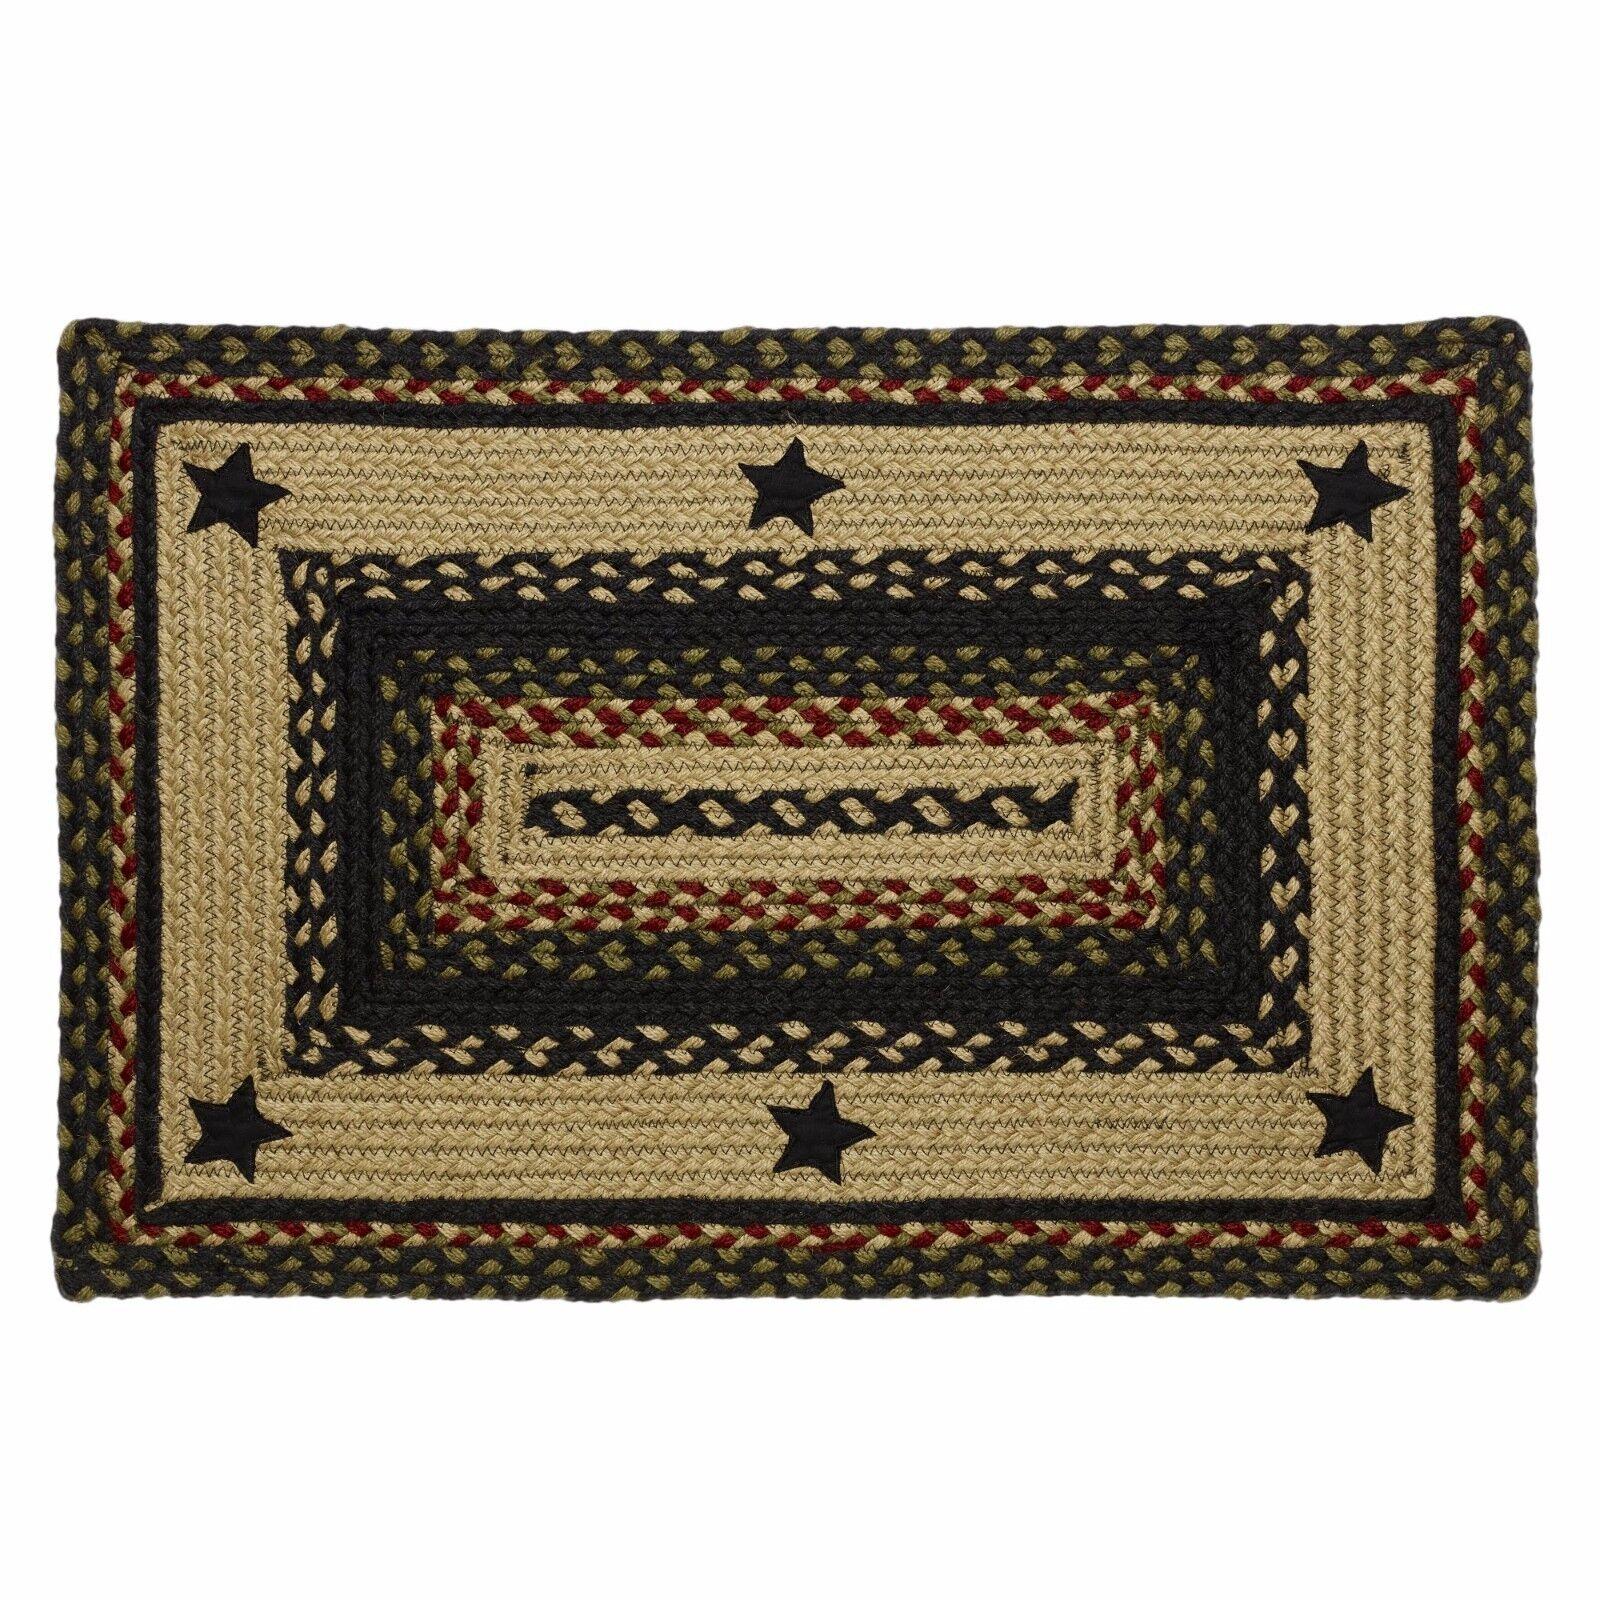 Ihf Home Decor 27 X 48 Braided Area Rug Rectangle Floor